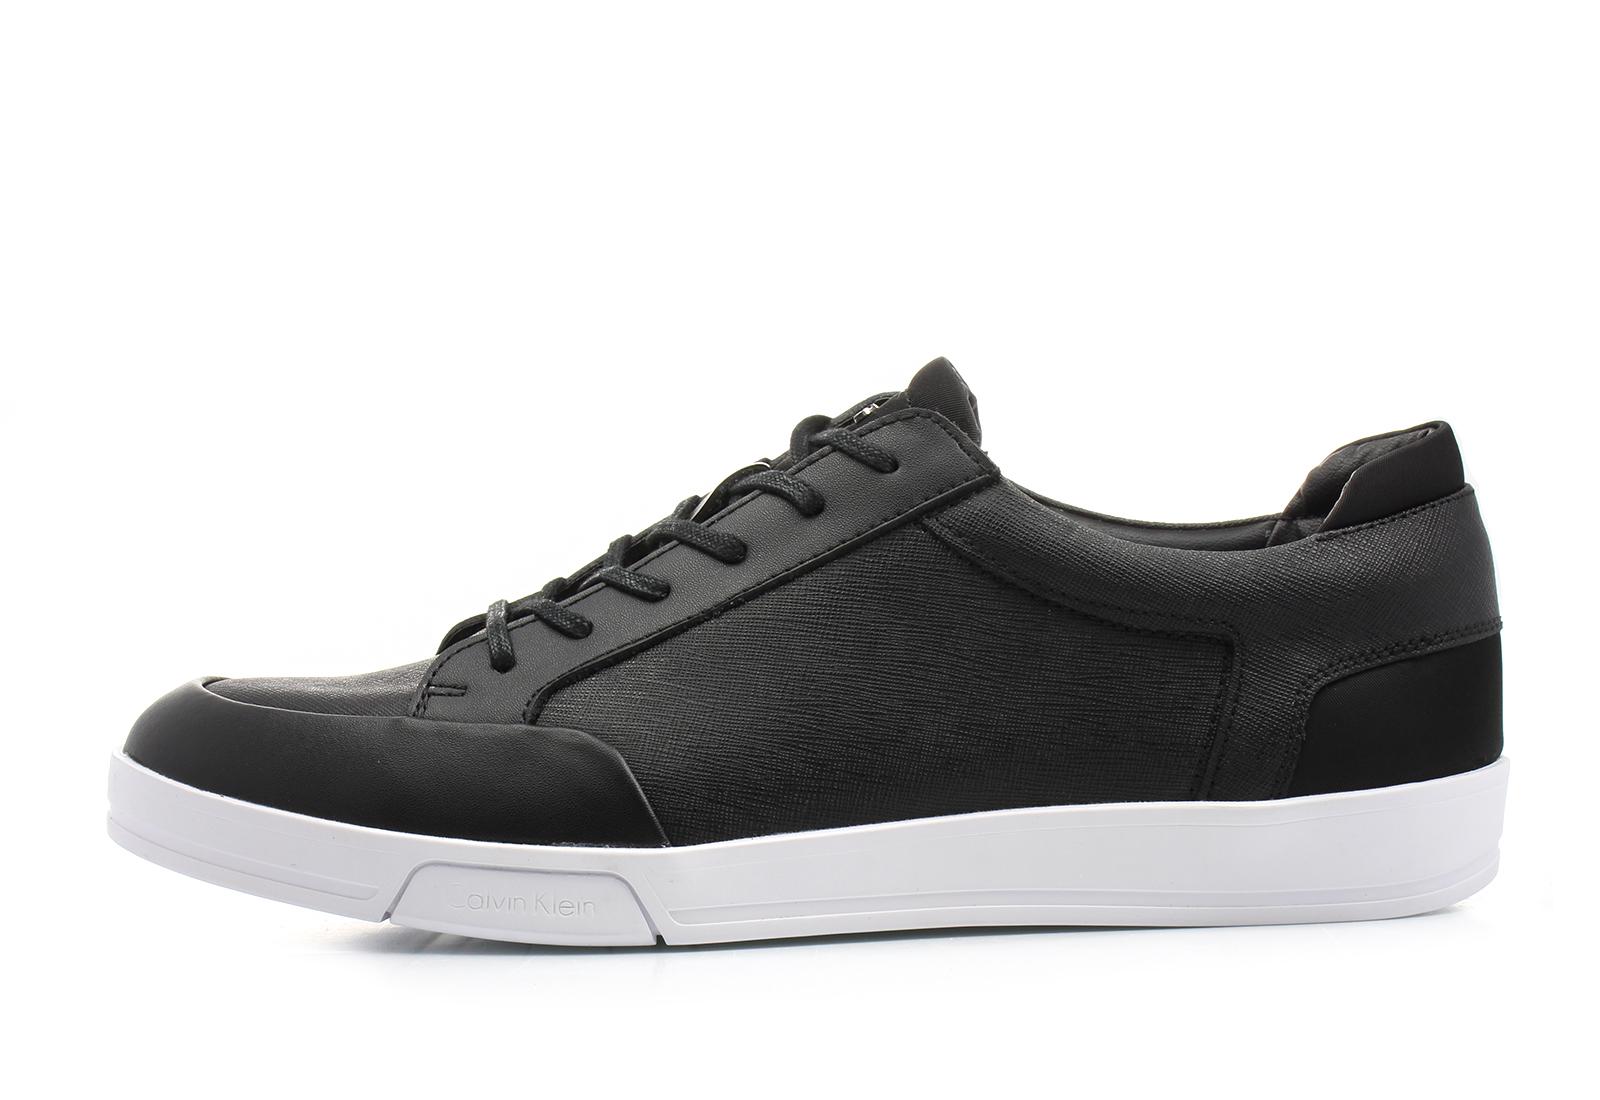 Calvin Klein Black Label Shoes Balin F1854 Blk